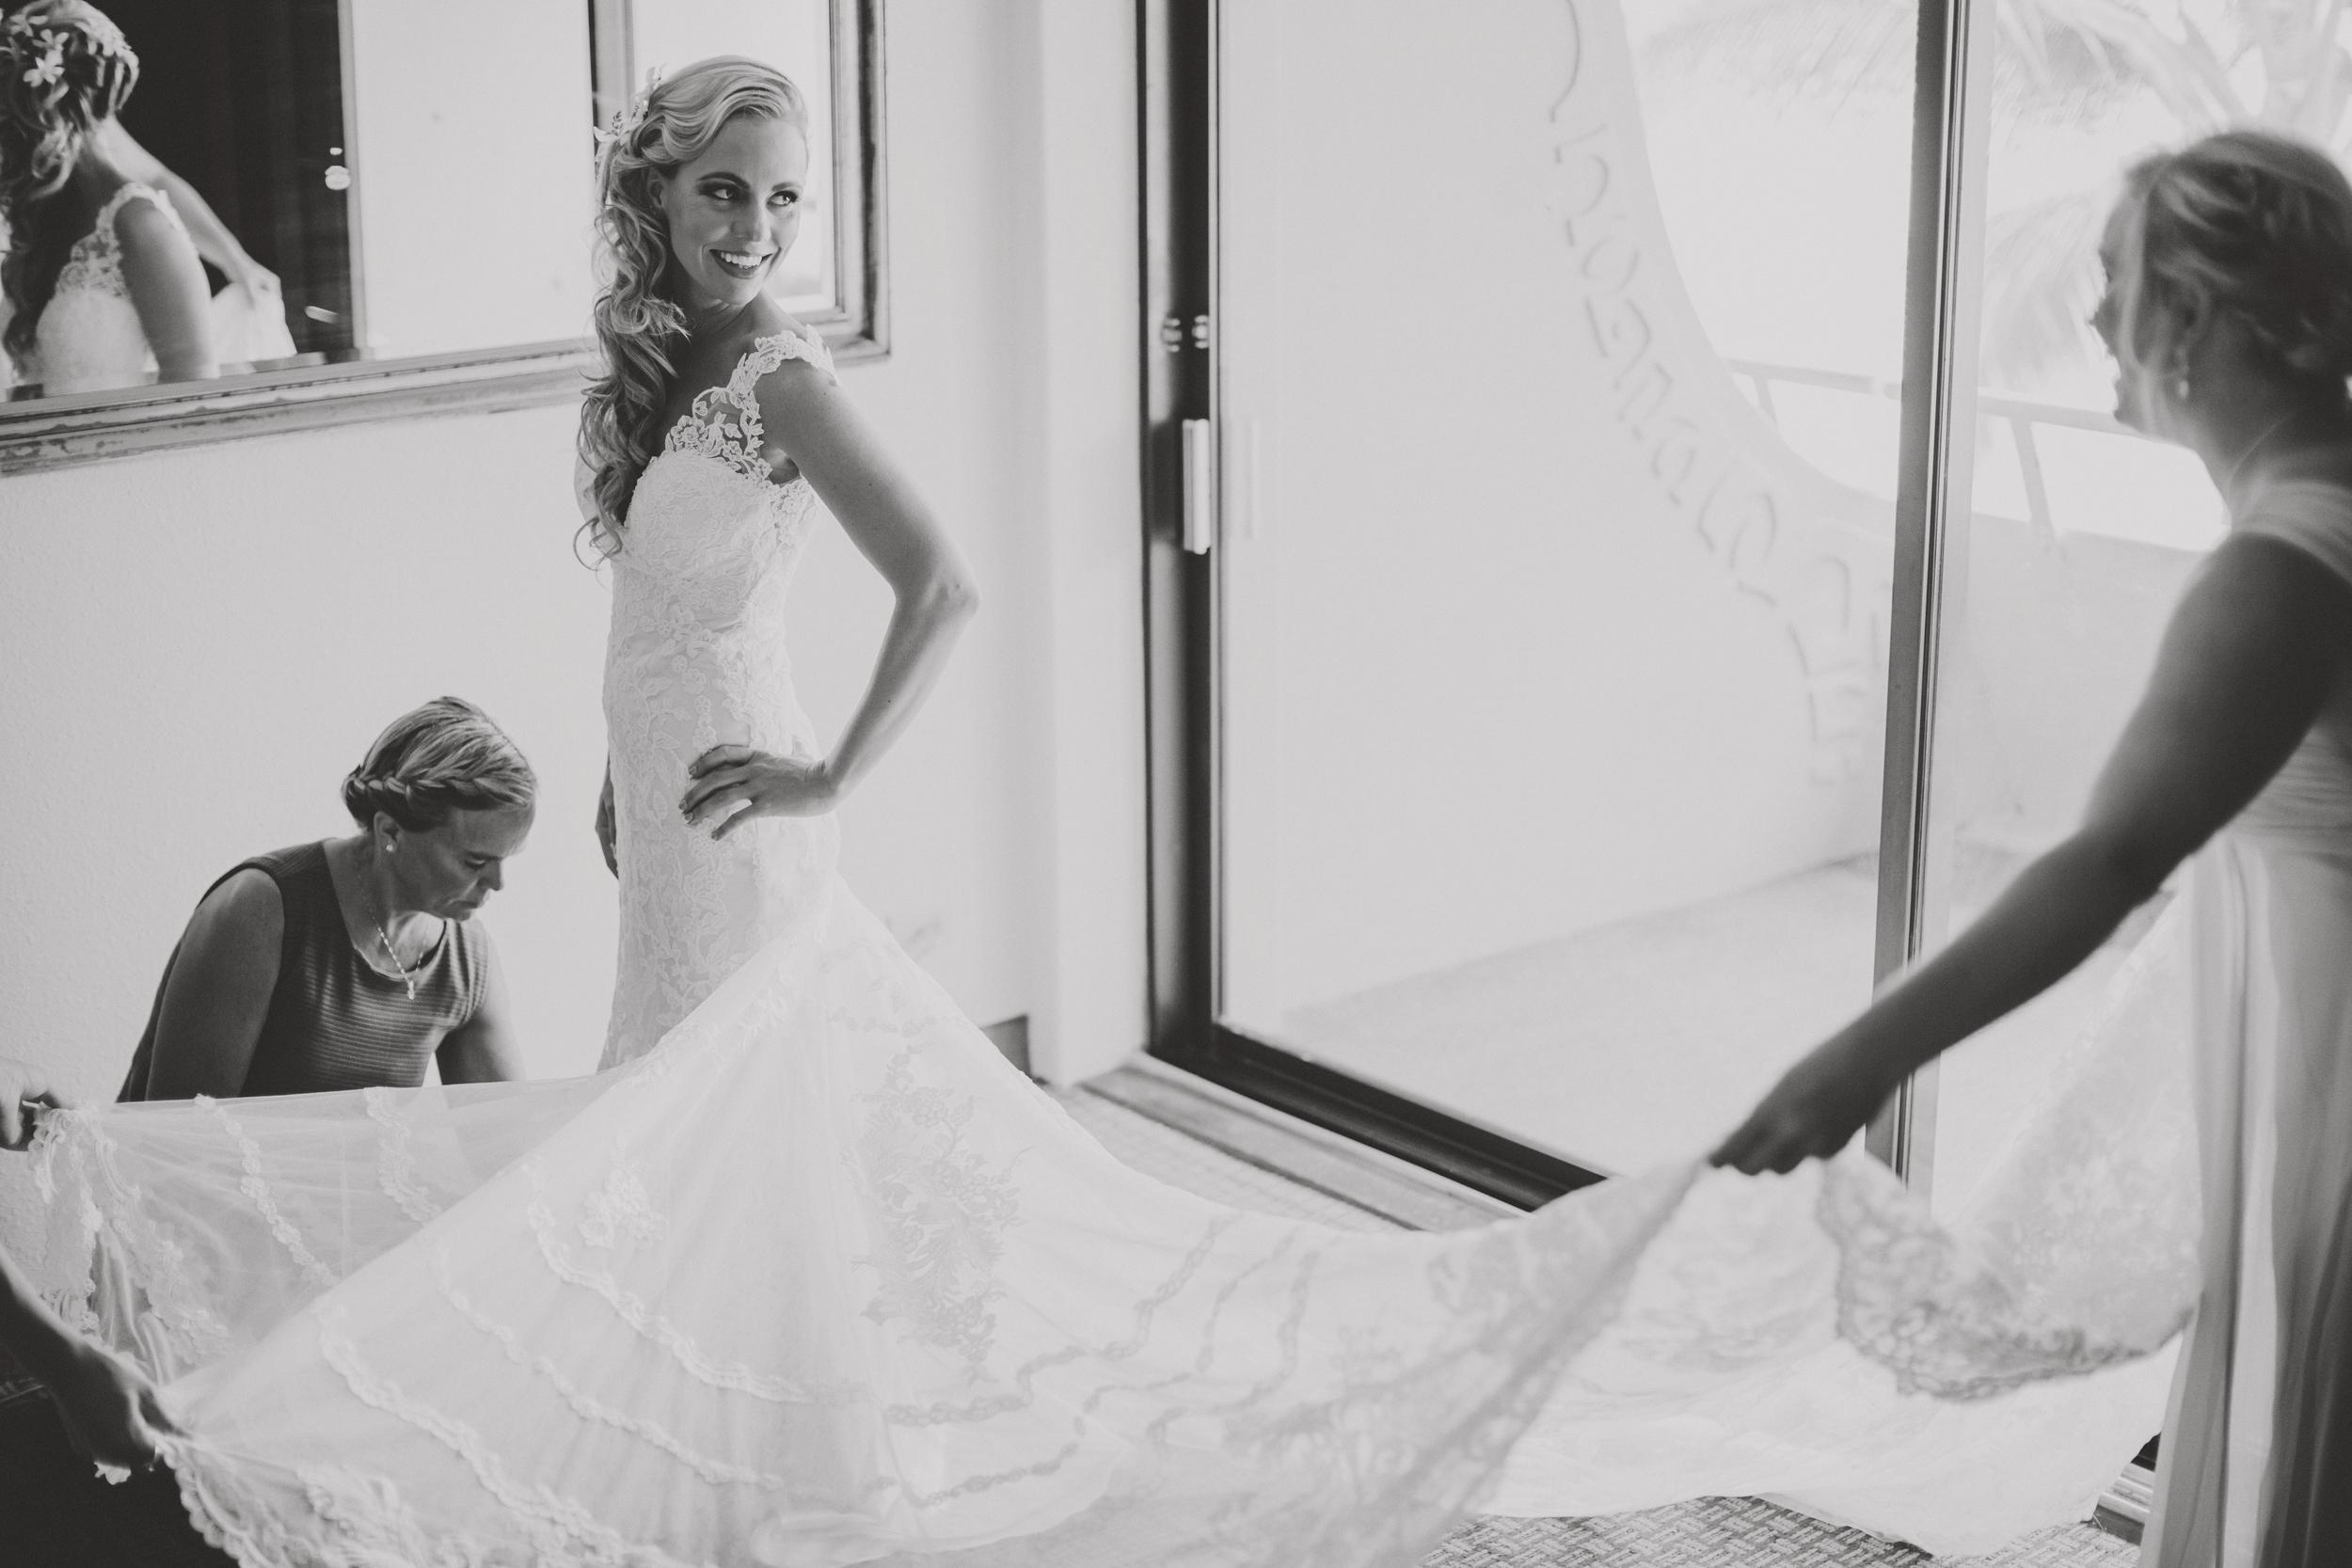 angie-diaz-photography-hawaii-wedding-photographer-kelli-jay-19.jpg